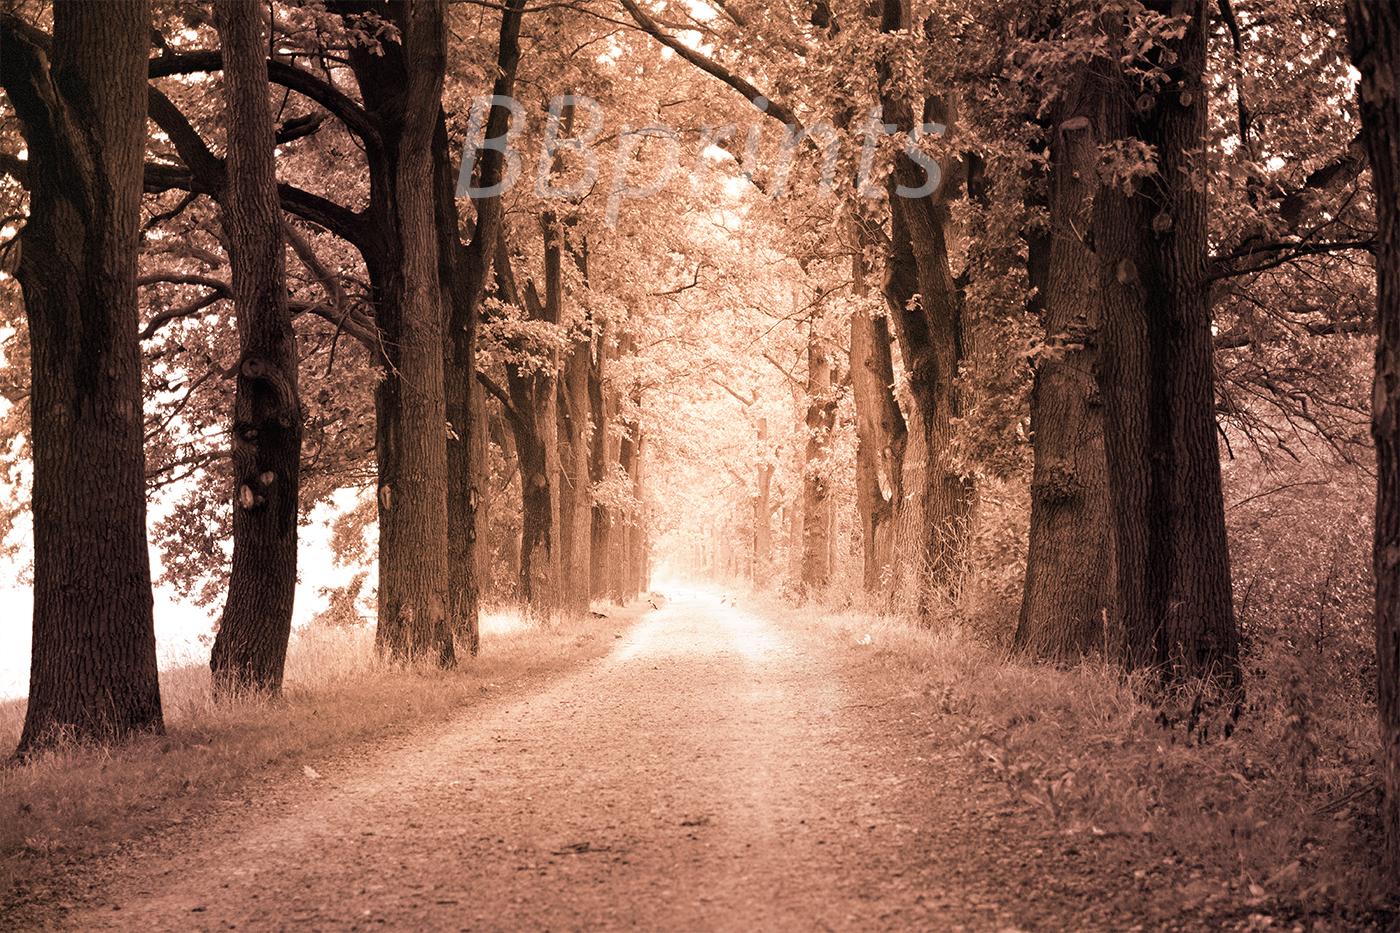 Nature photo, landscape photo, autumn alley photo, example image 1